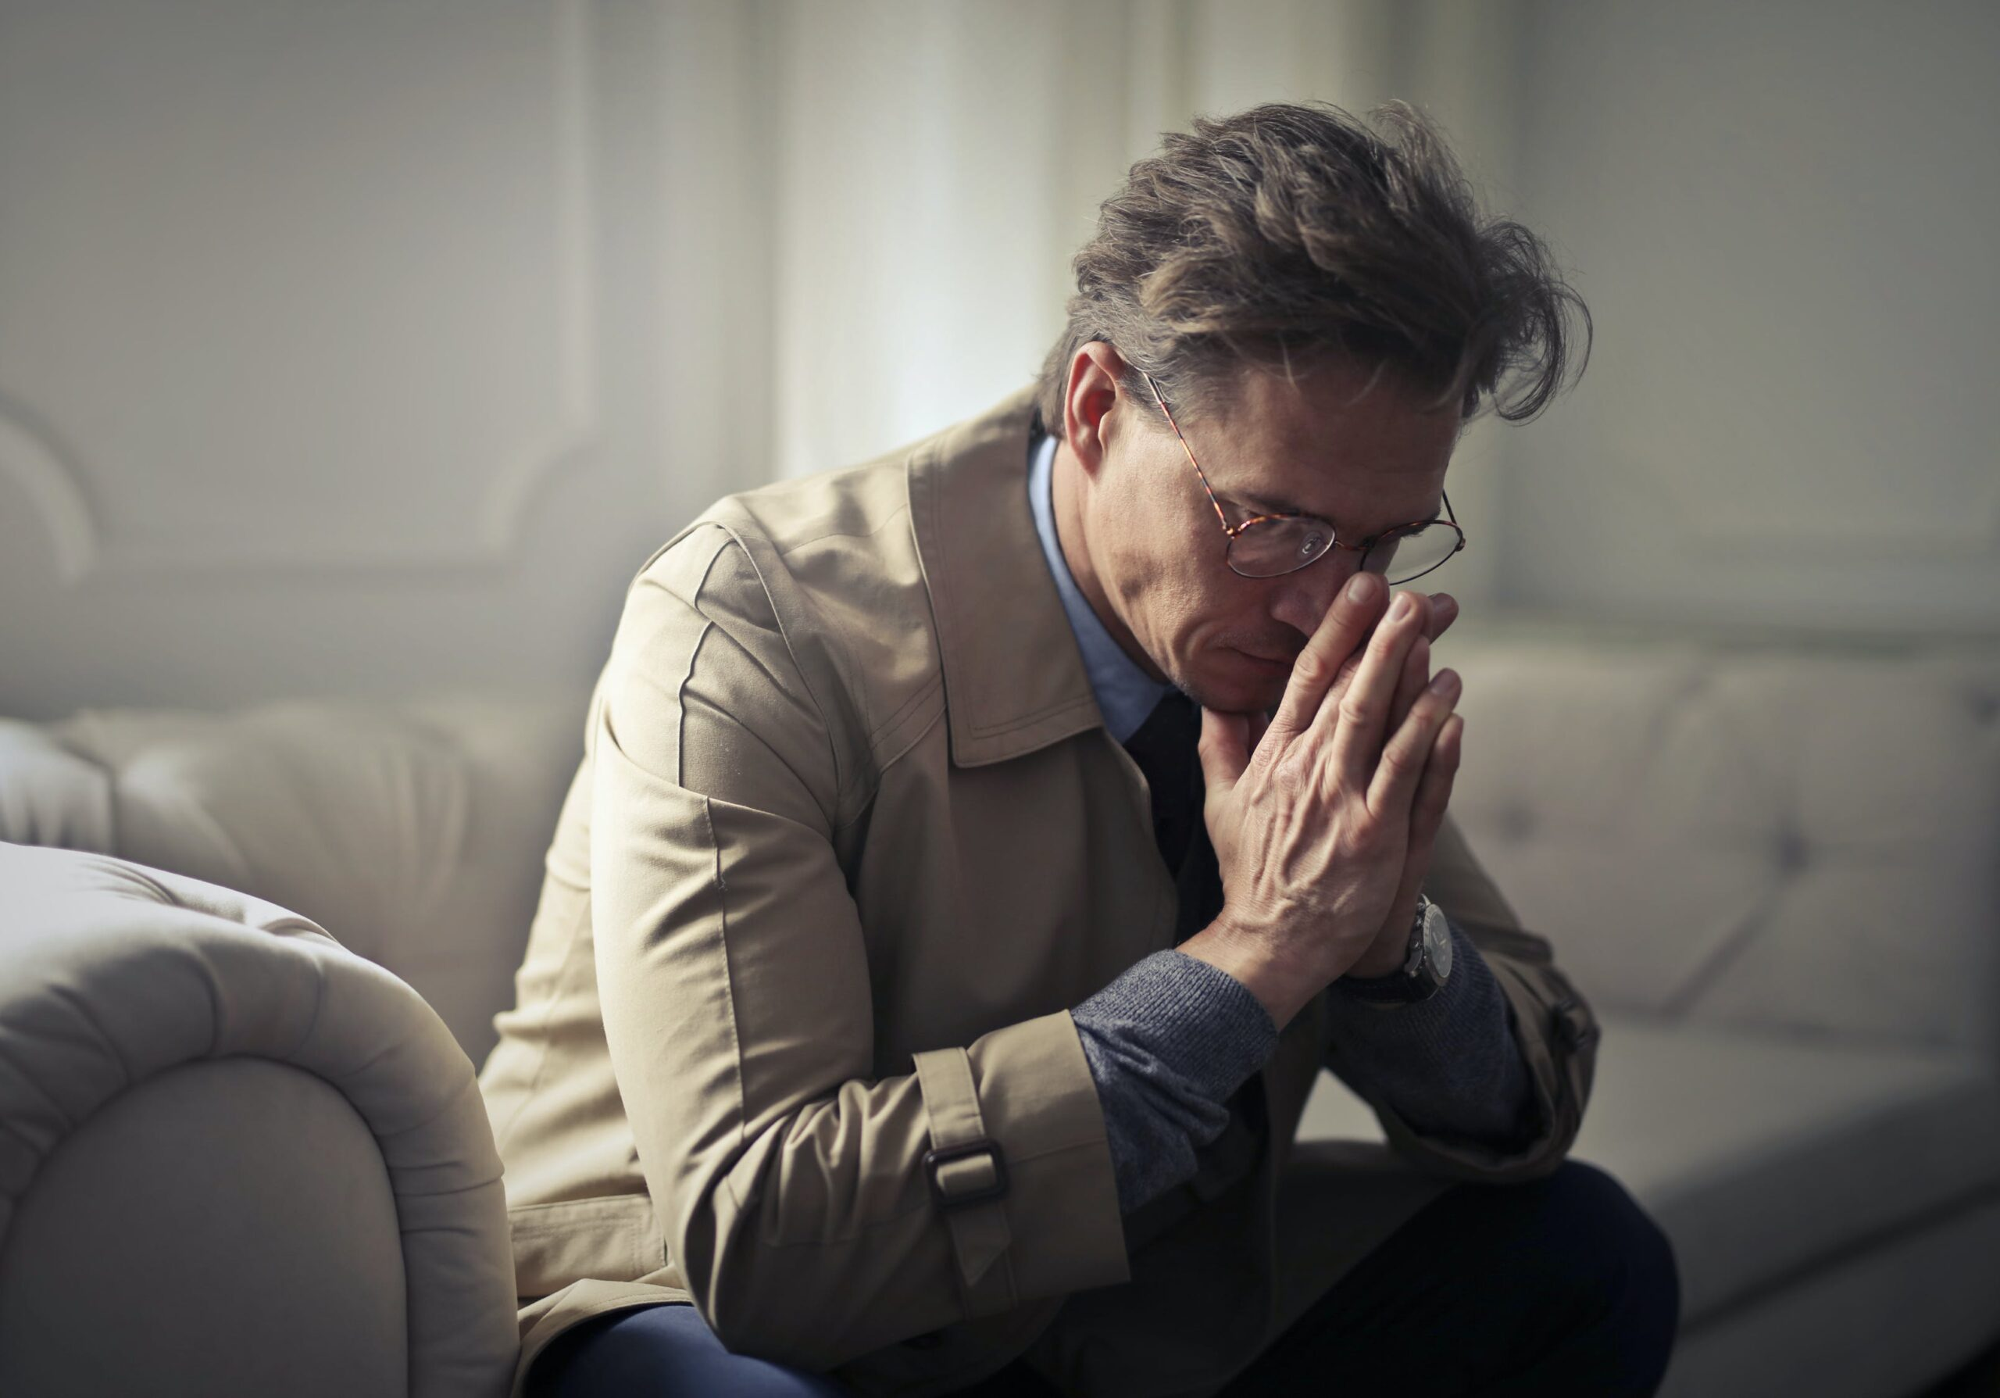 krise-terapi-psykologi-psykoterapi-problemer-vivi-hinrichs-aarhus